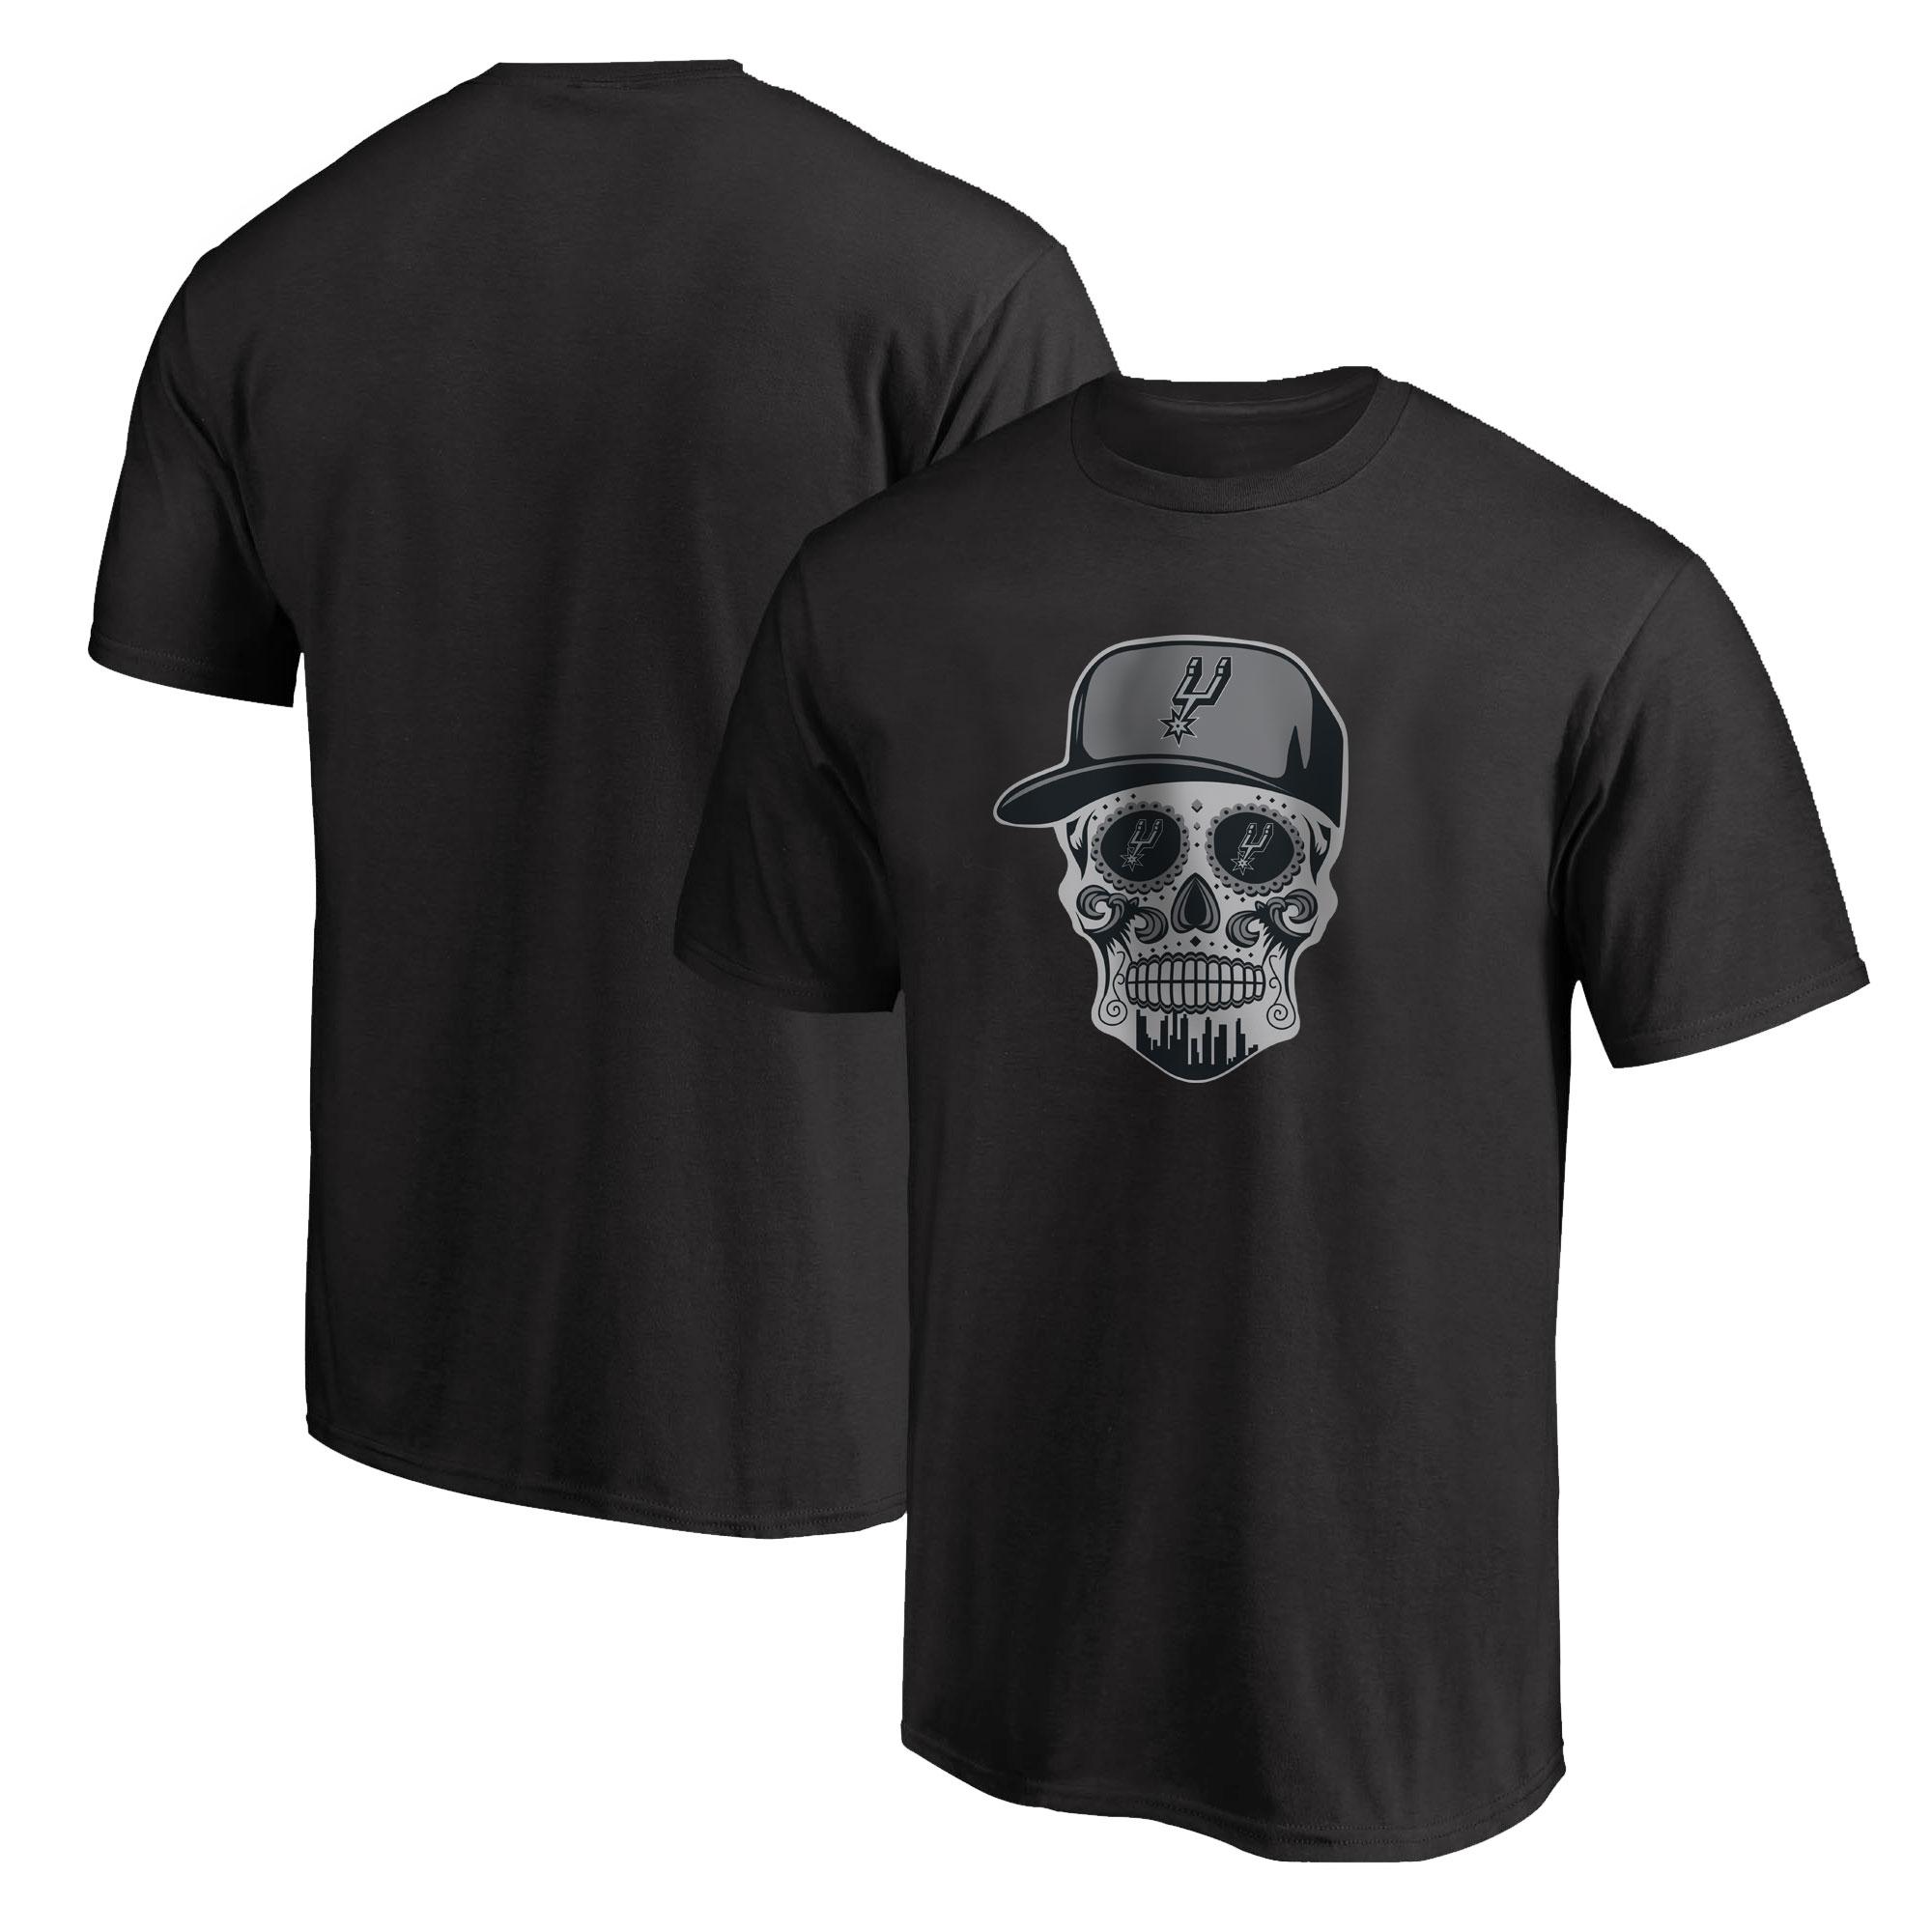 Spurs Skull Tshirt (TSH-BLC-NP-464-SPURS-SKULL)